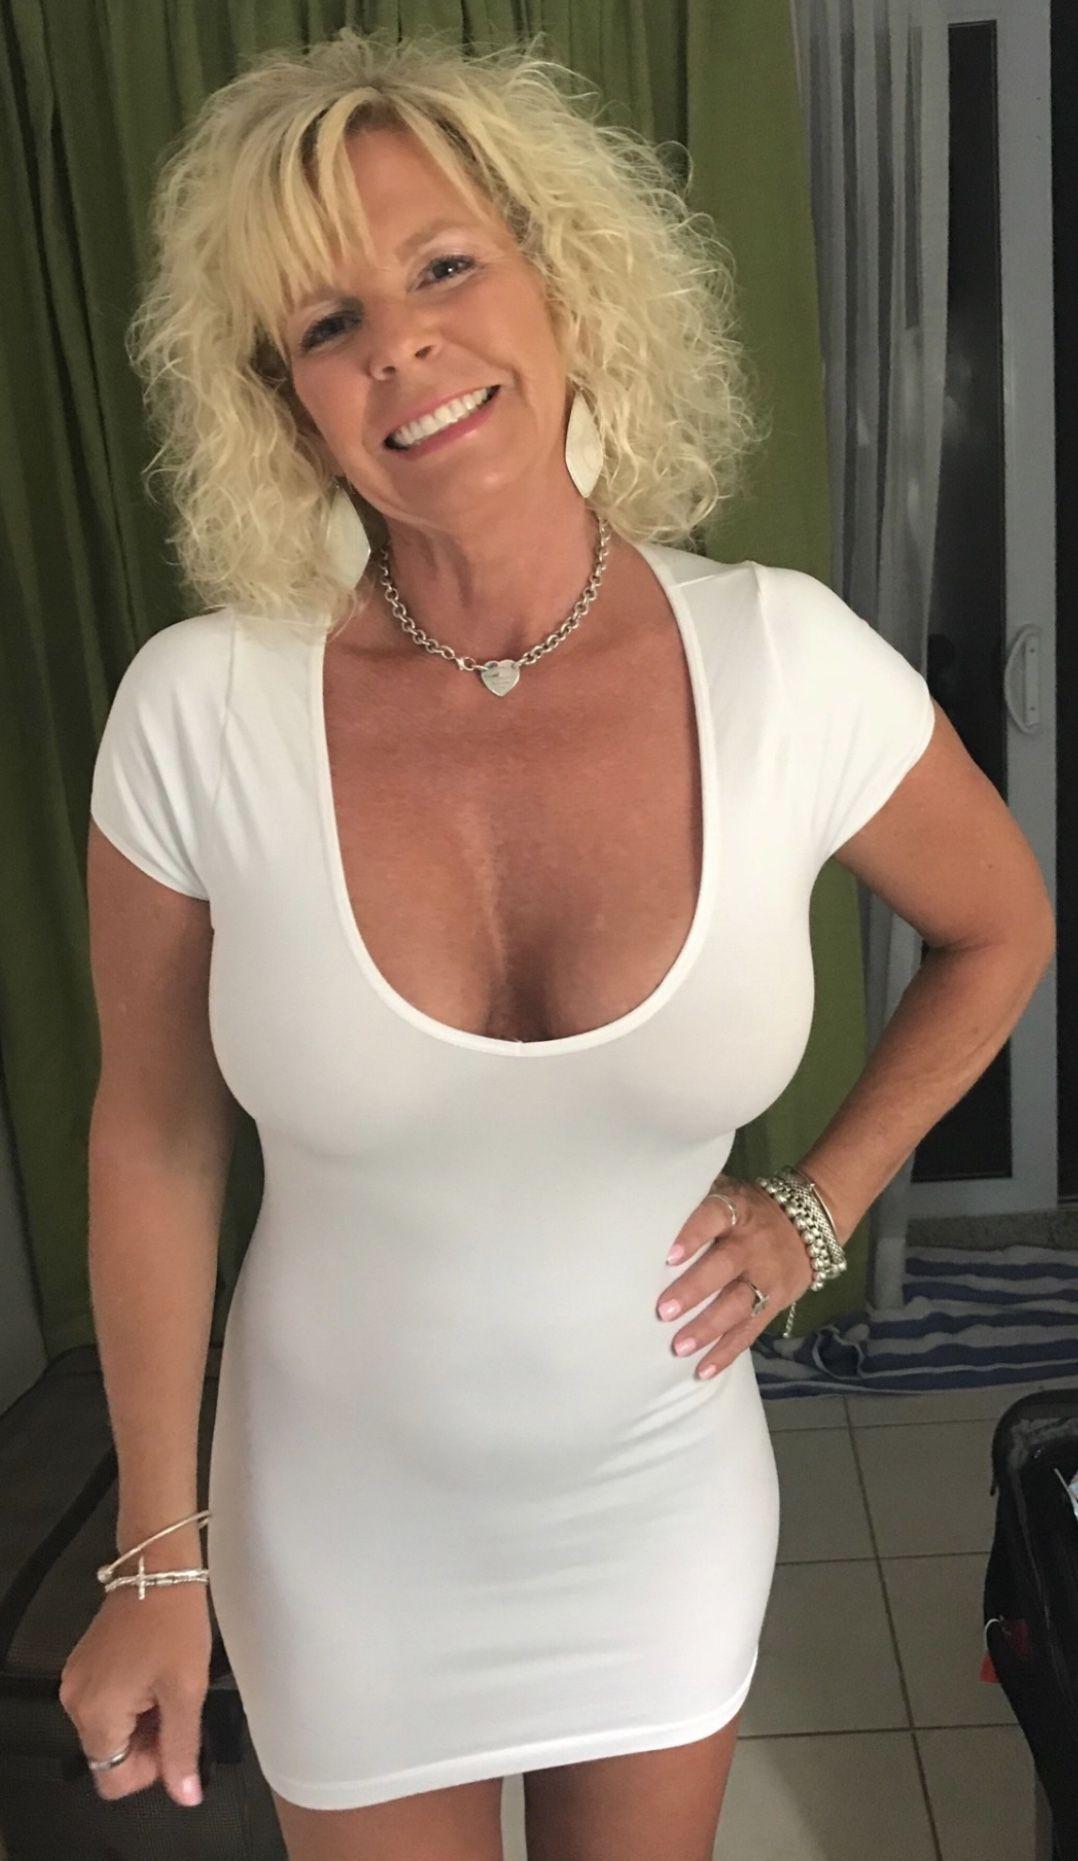 Women old sexy Hottest Women